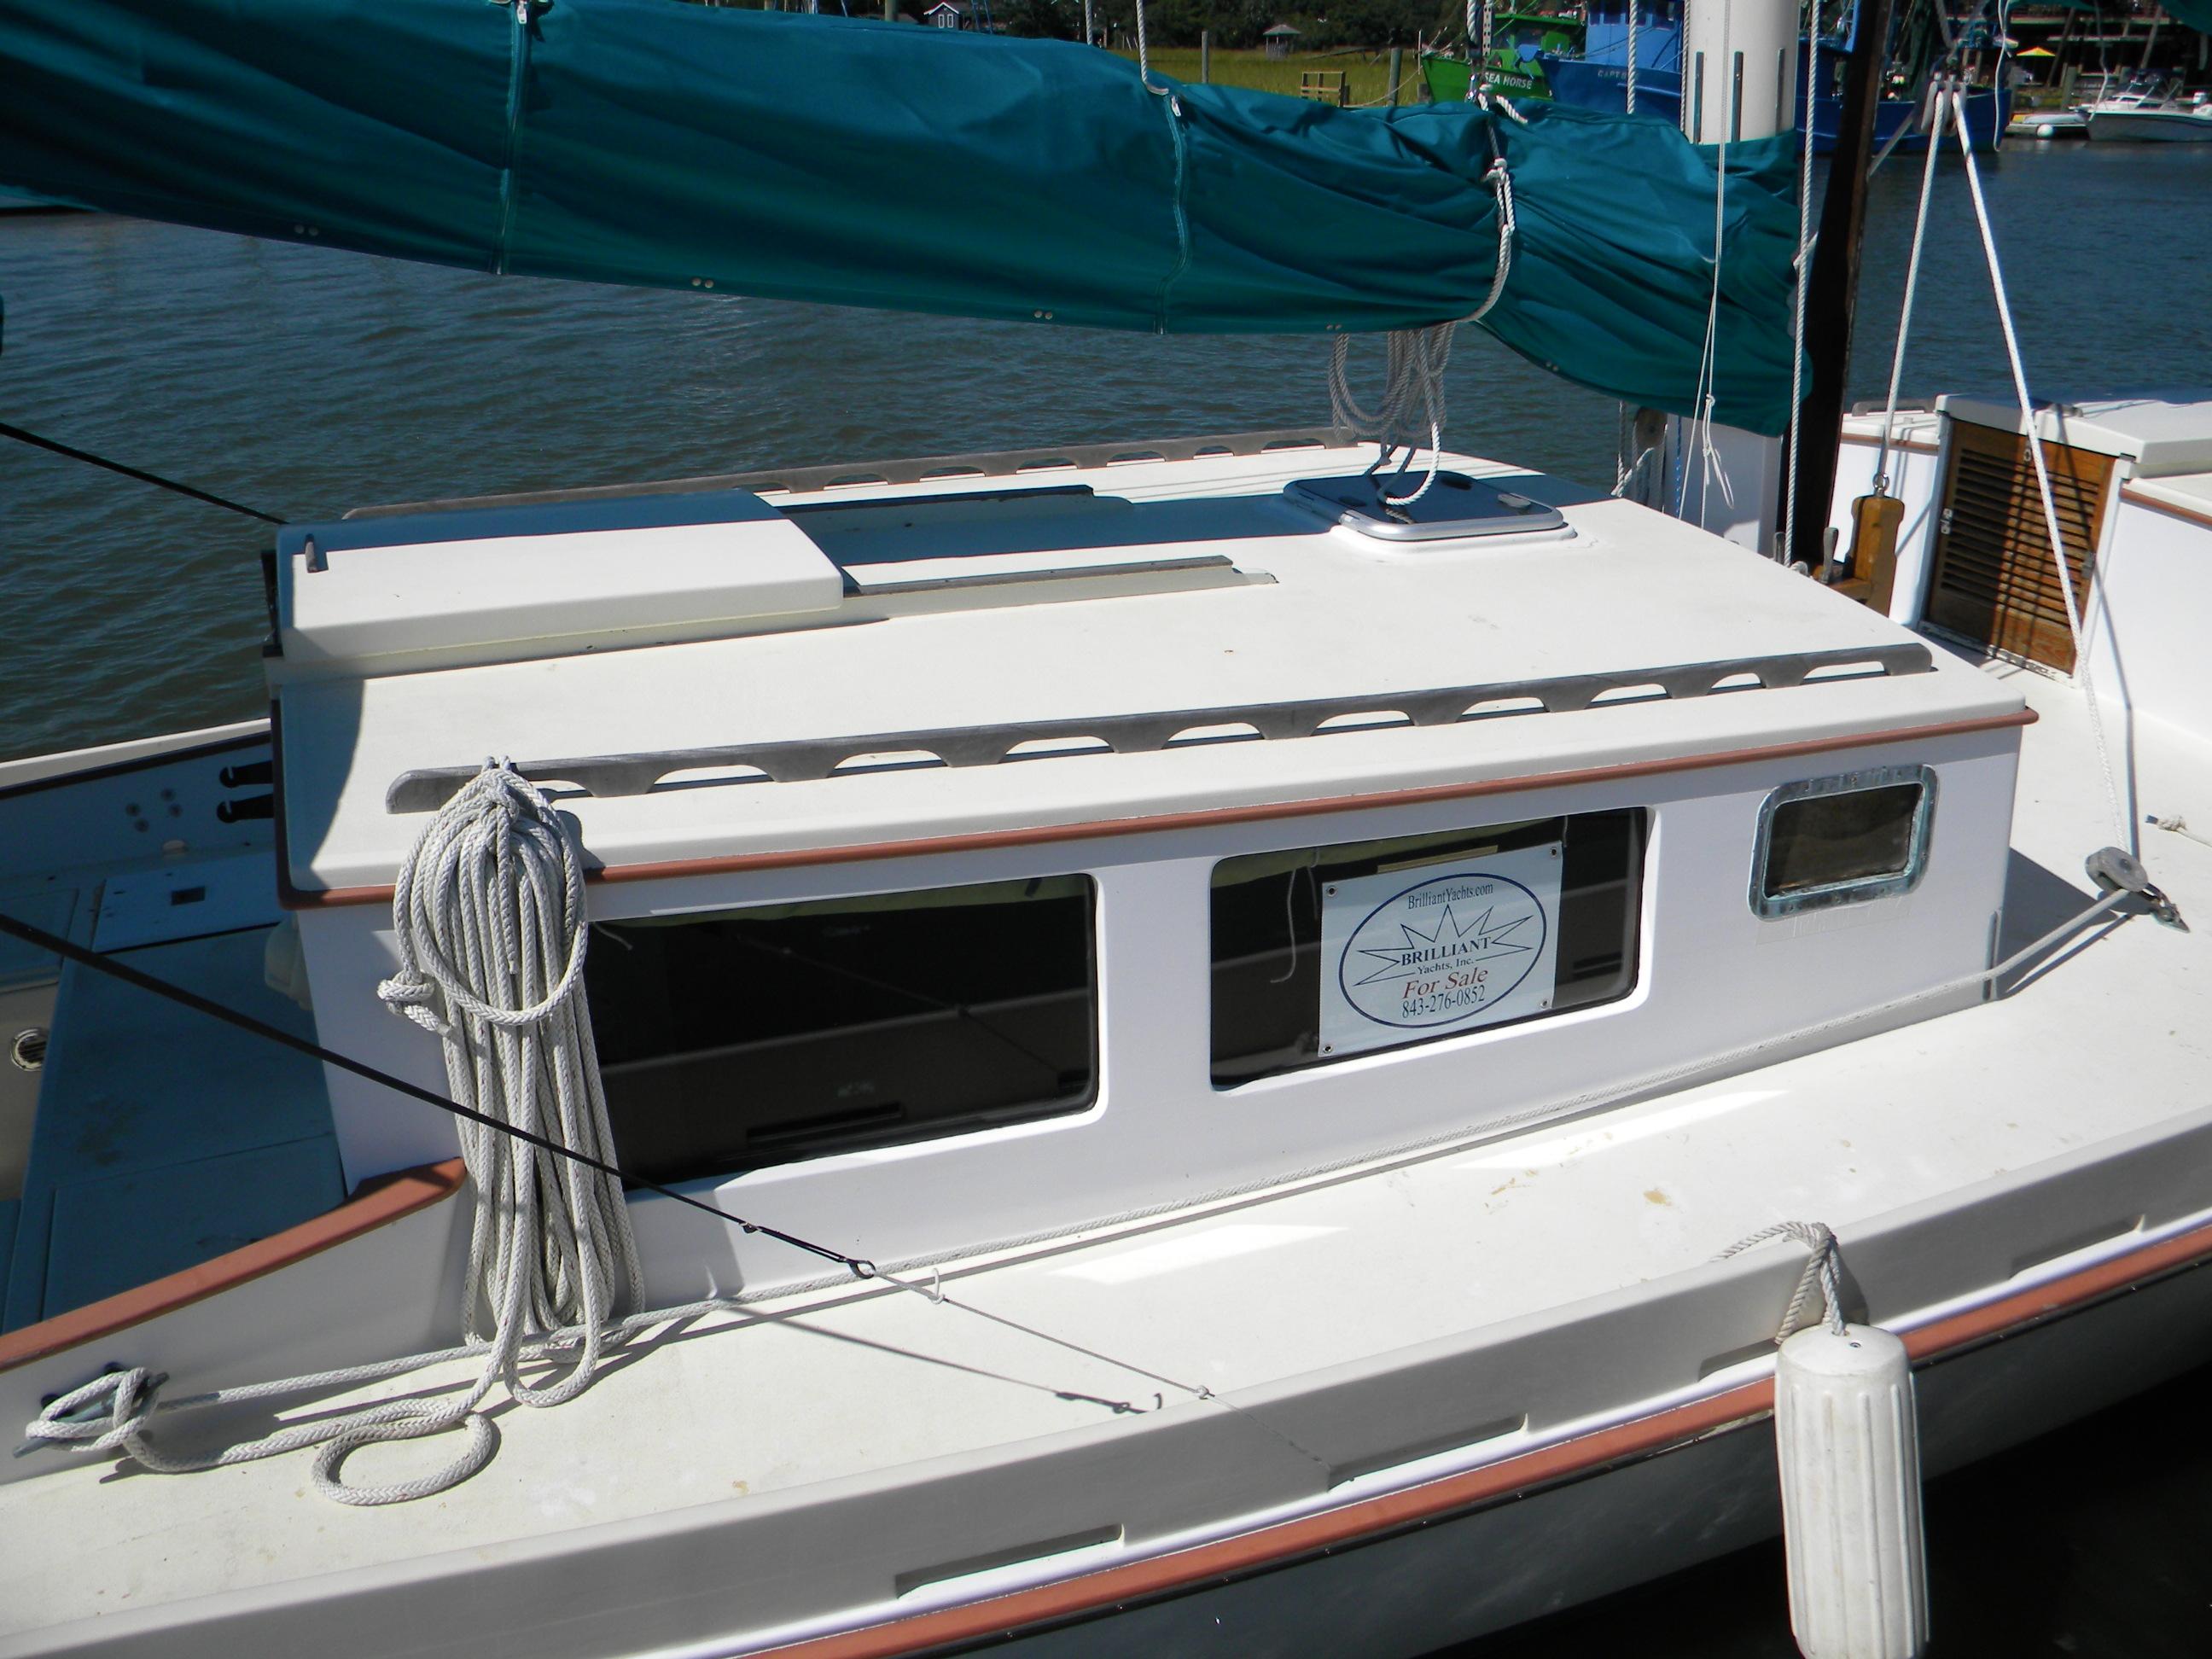 Bahamas liveaboard   Brilliant Yachts >>> Power & Sail